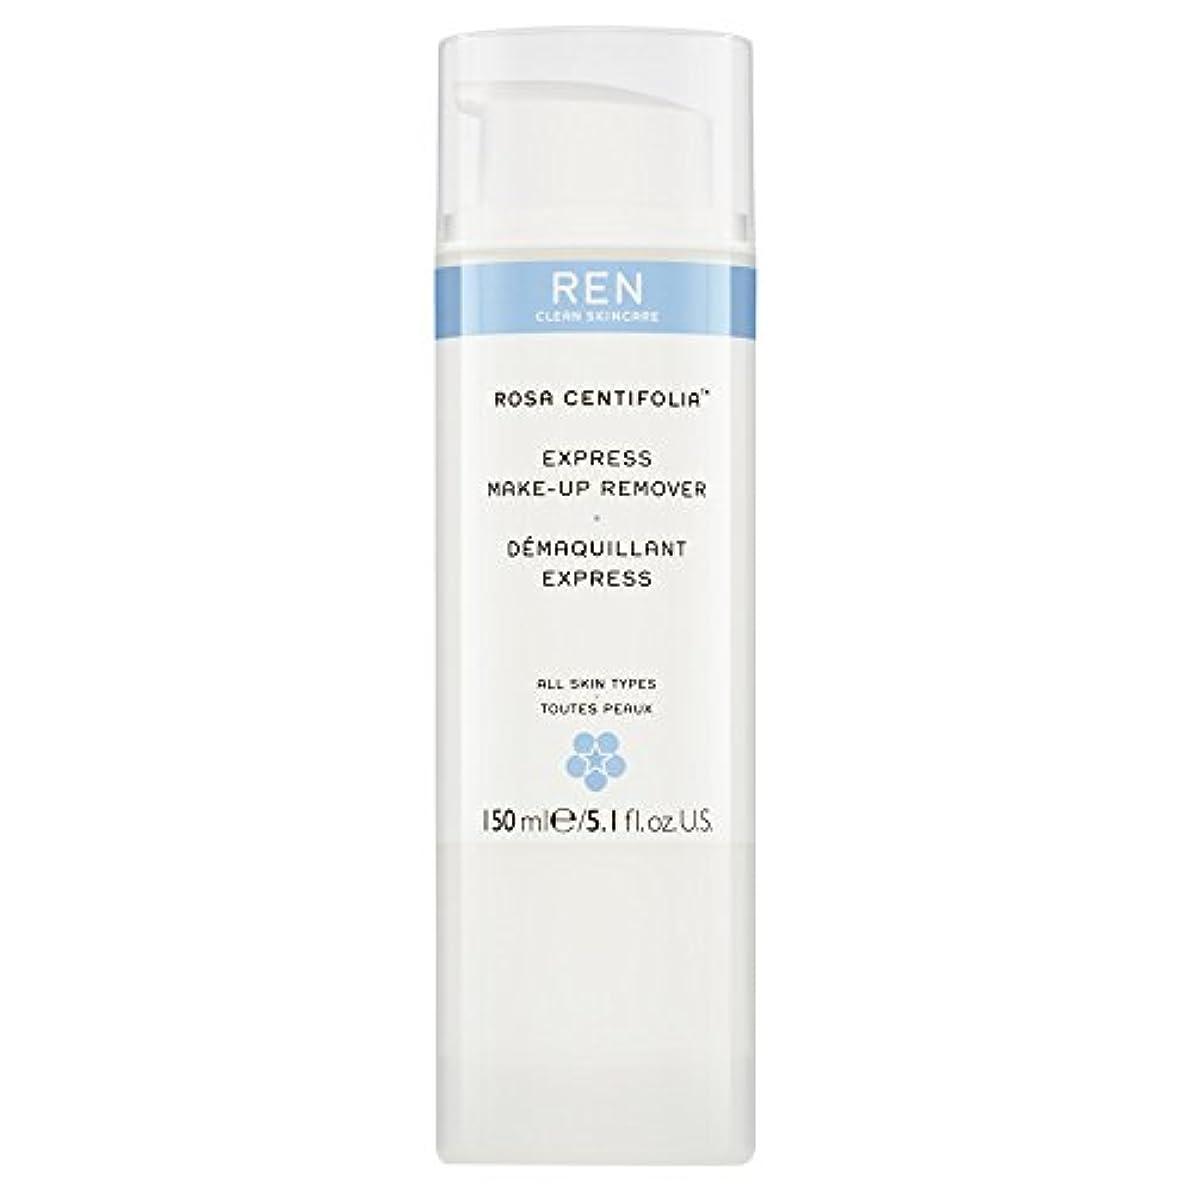 Renローザセンチフォリアバラメイクアップリムーバー150ミリリットル (REN) - REN Rosa Centifolia Makeup Remover 150ml [並行輸入品]